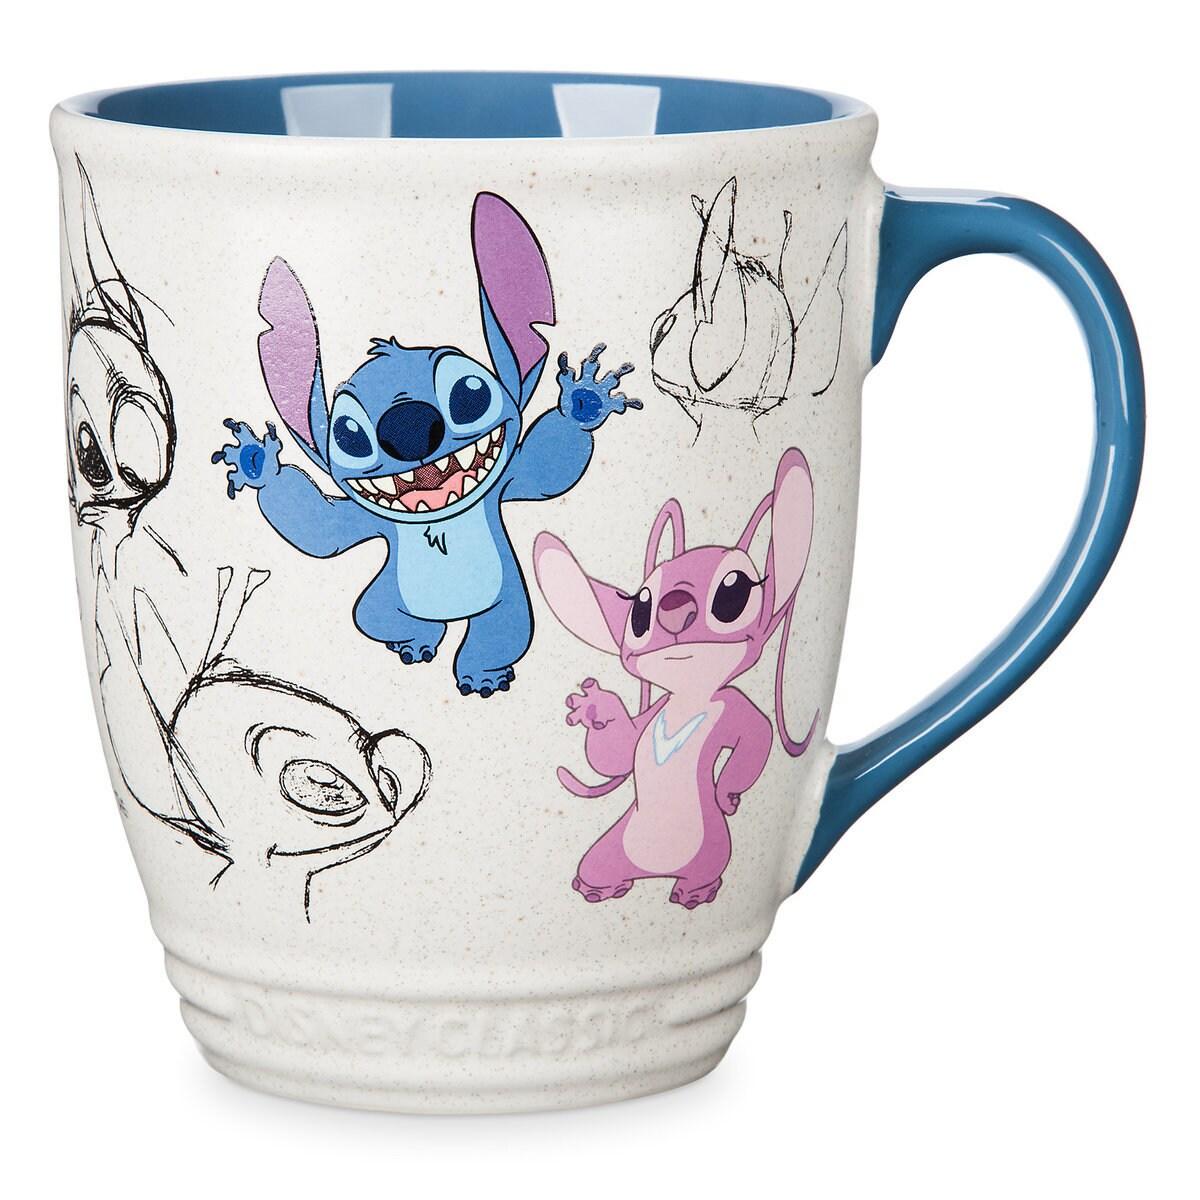 fbc63273853 Stitch and Angel Mug - Lilo & Stitch - Disney Classics Collection